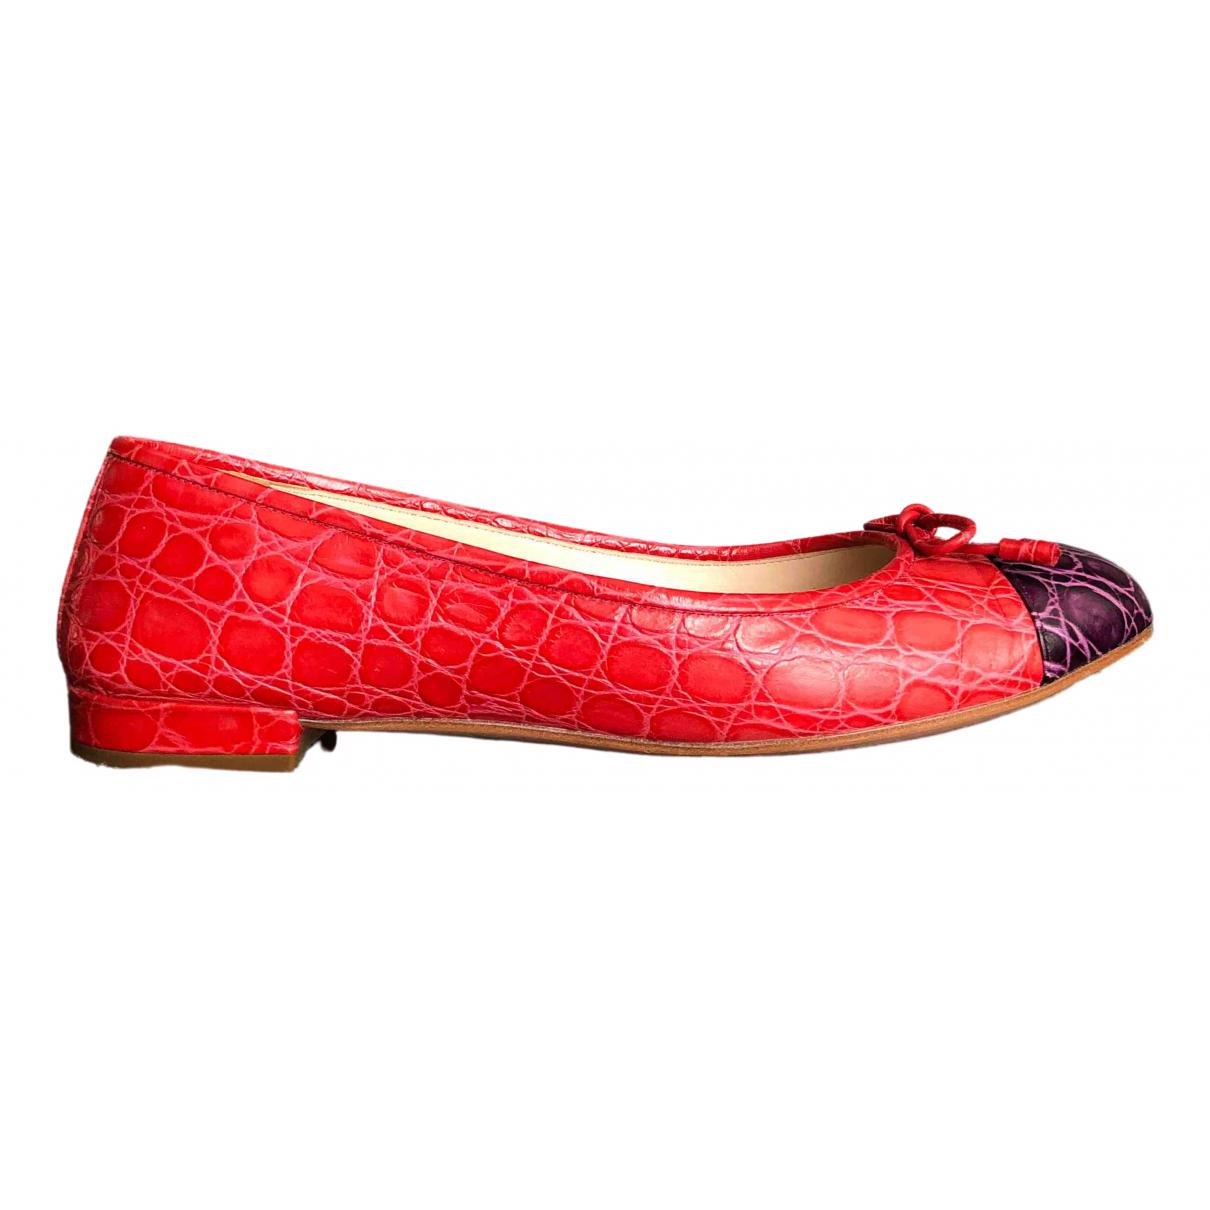 Prada - Ballerines   pour femme en cuir - multicolore